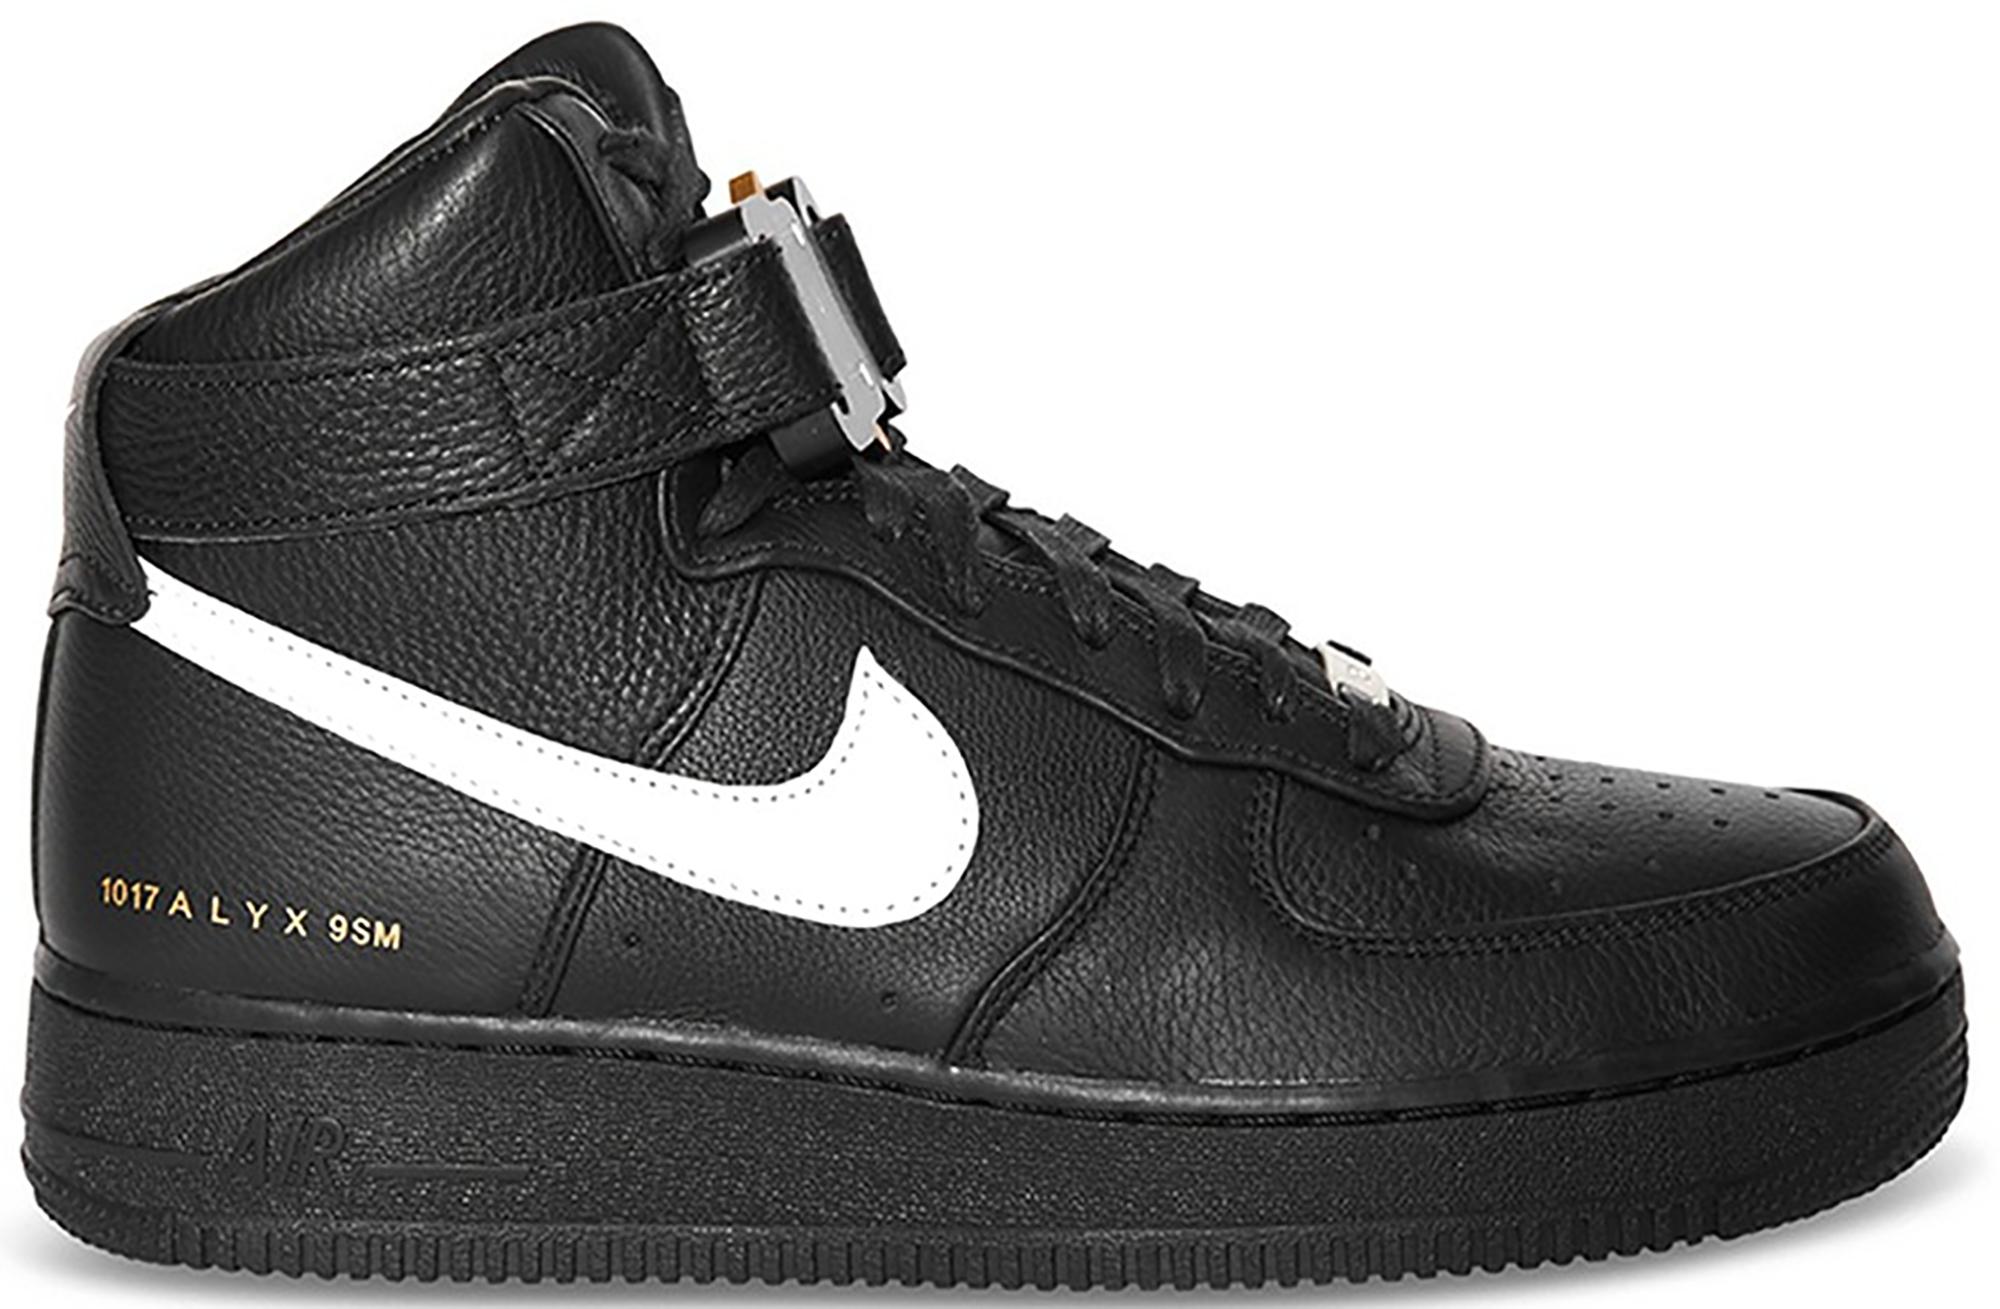 Nike Air Force 1 High 1017 ALYX 9SM